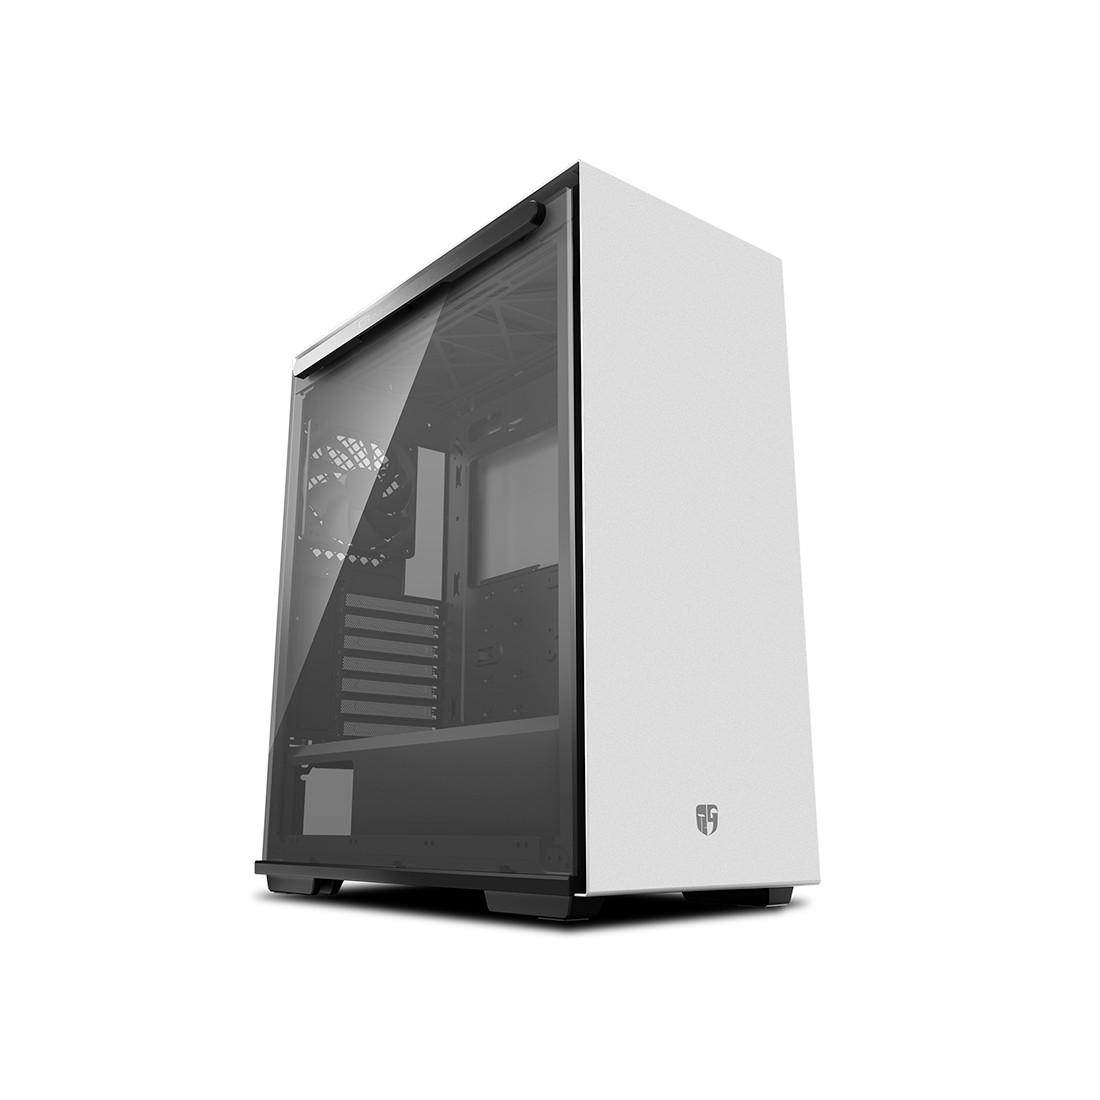 Компьютерный корпус Deepcool MACUBE 310P WH